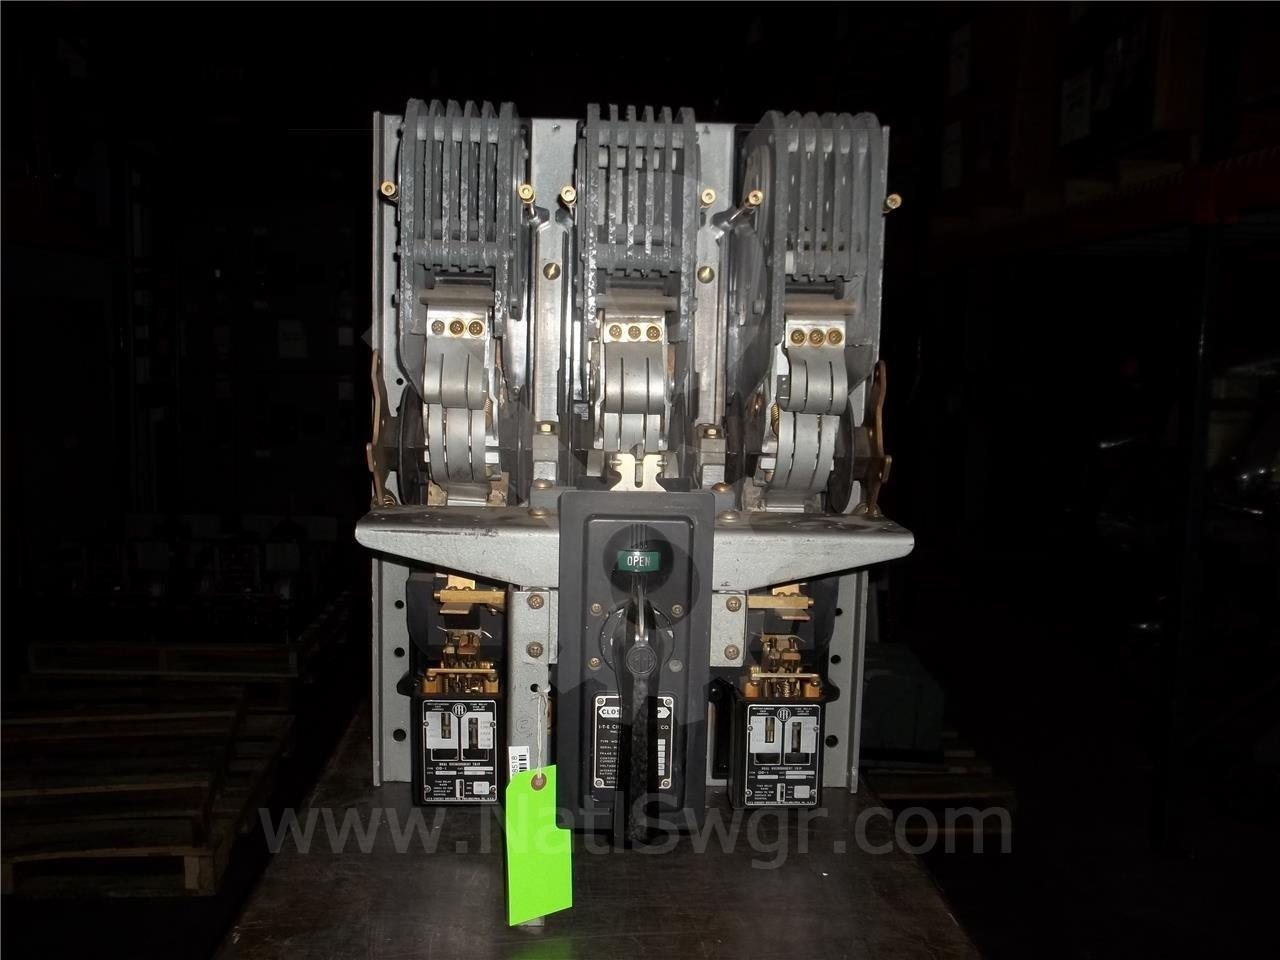 KCG-1600 - 1600A ITE KCG-1600 MO/BI